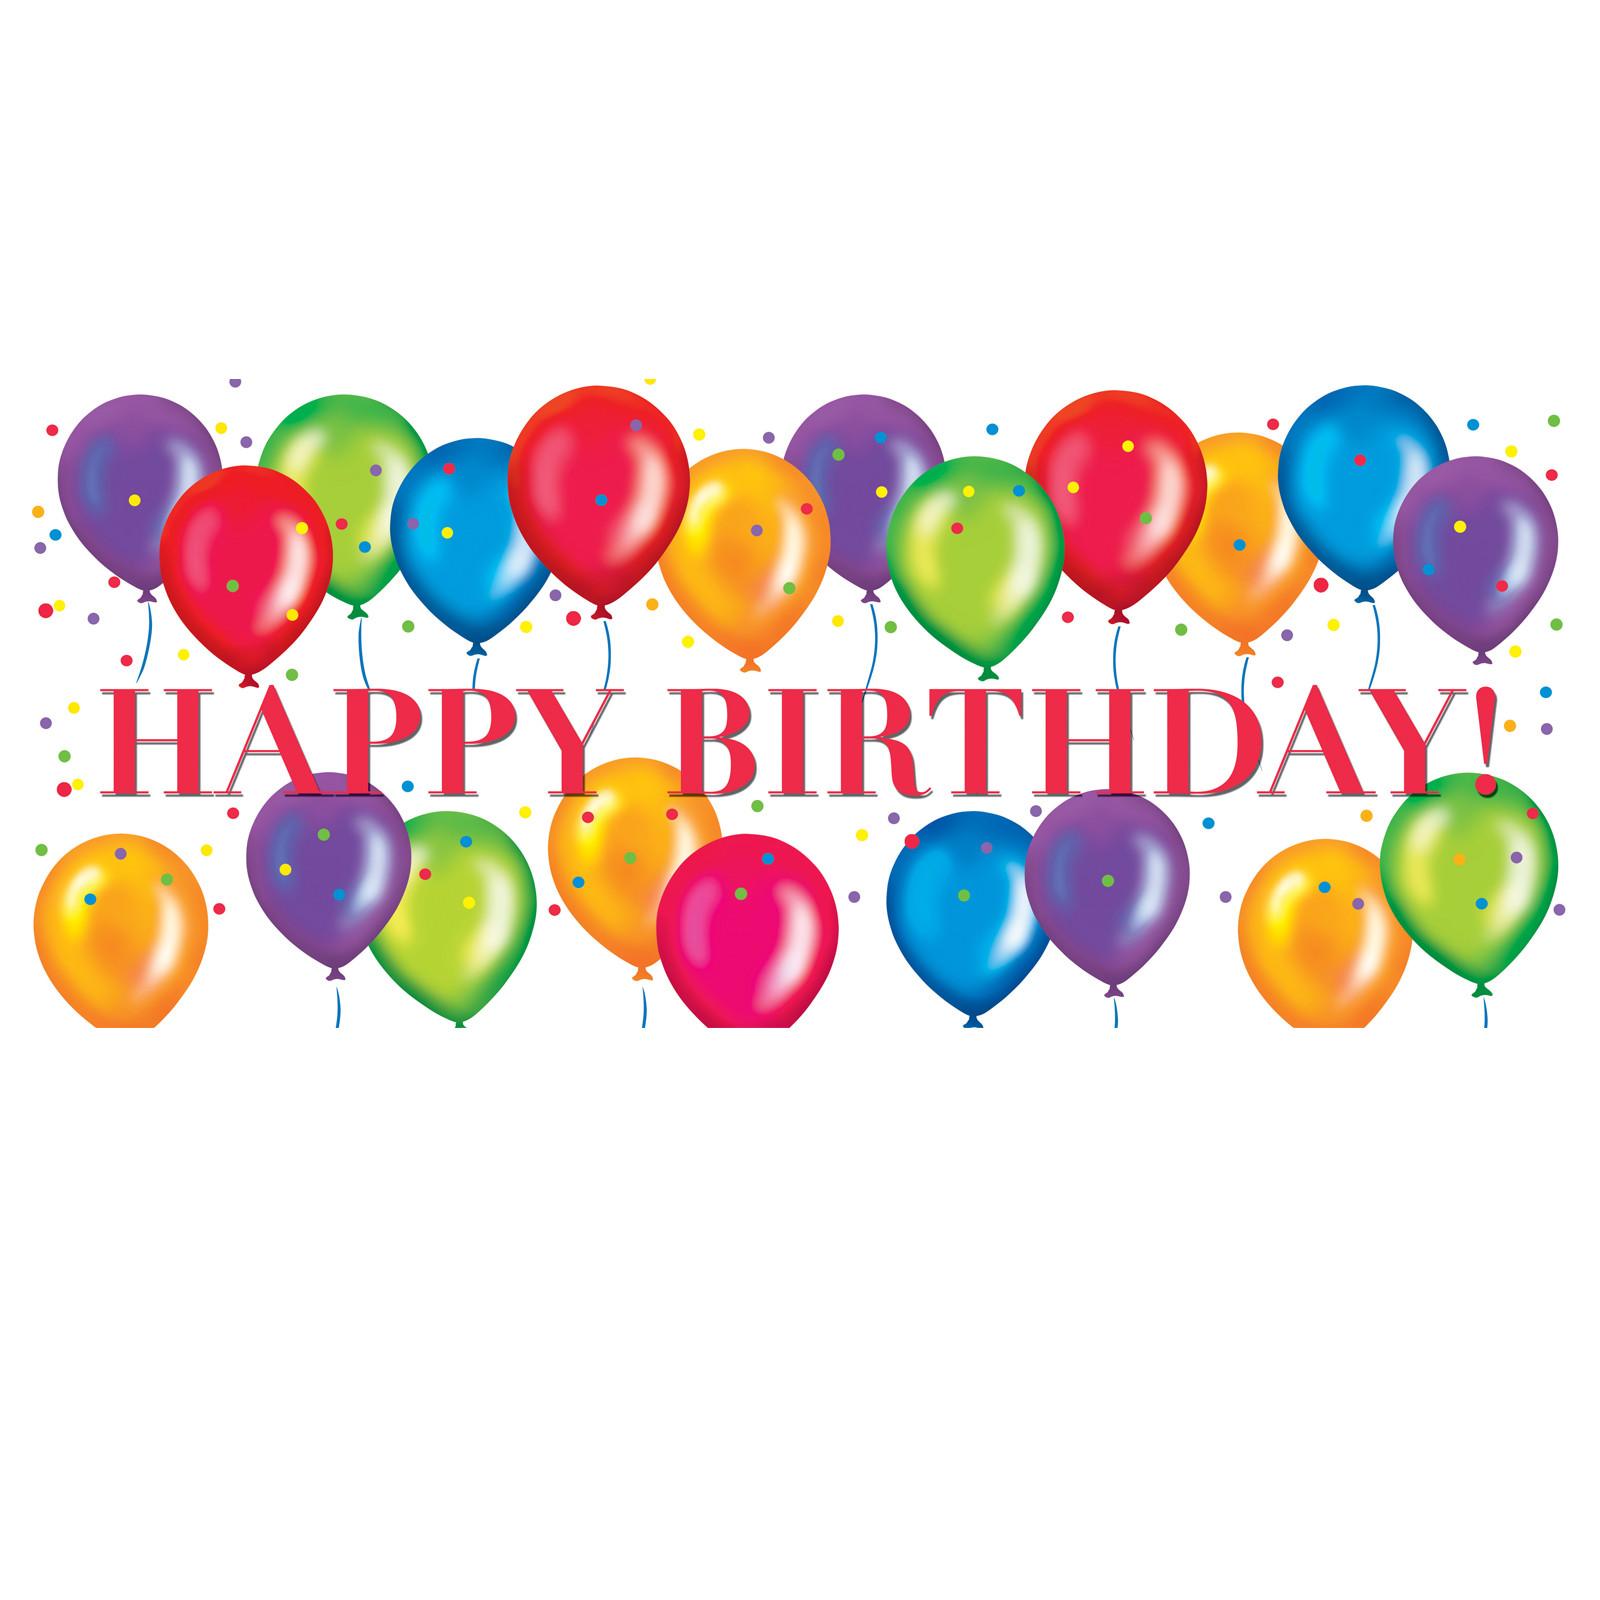 1600x1600 Happy Birthday Banner Template Word Best Of Happy Birthday